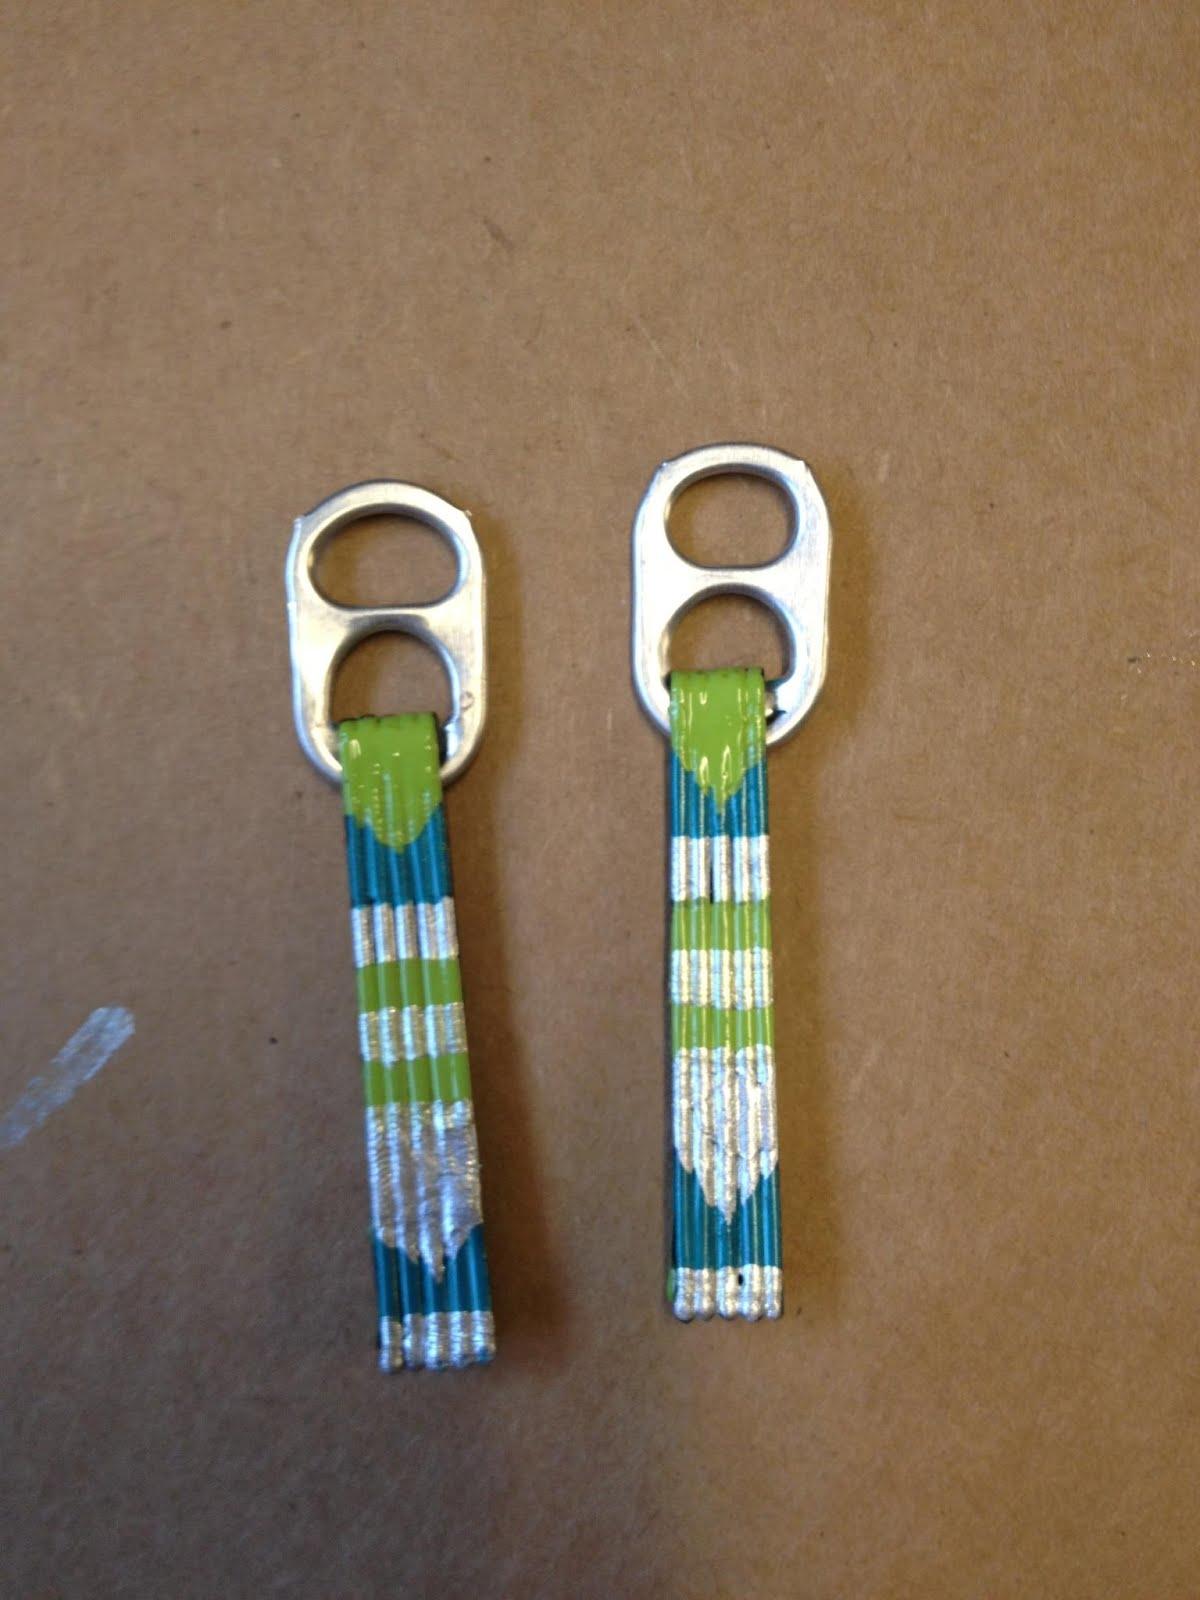 unphotoshopped: diy: bobby pin earrings